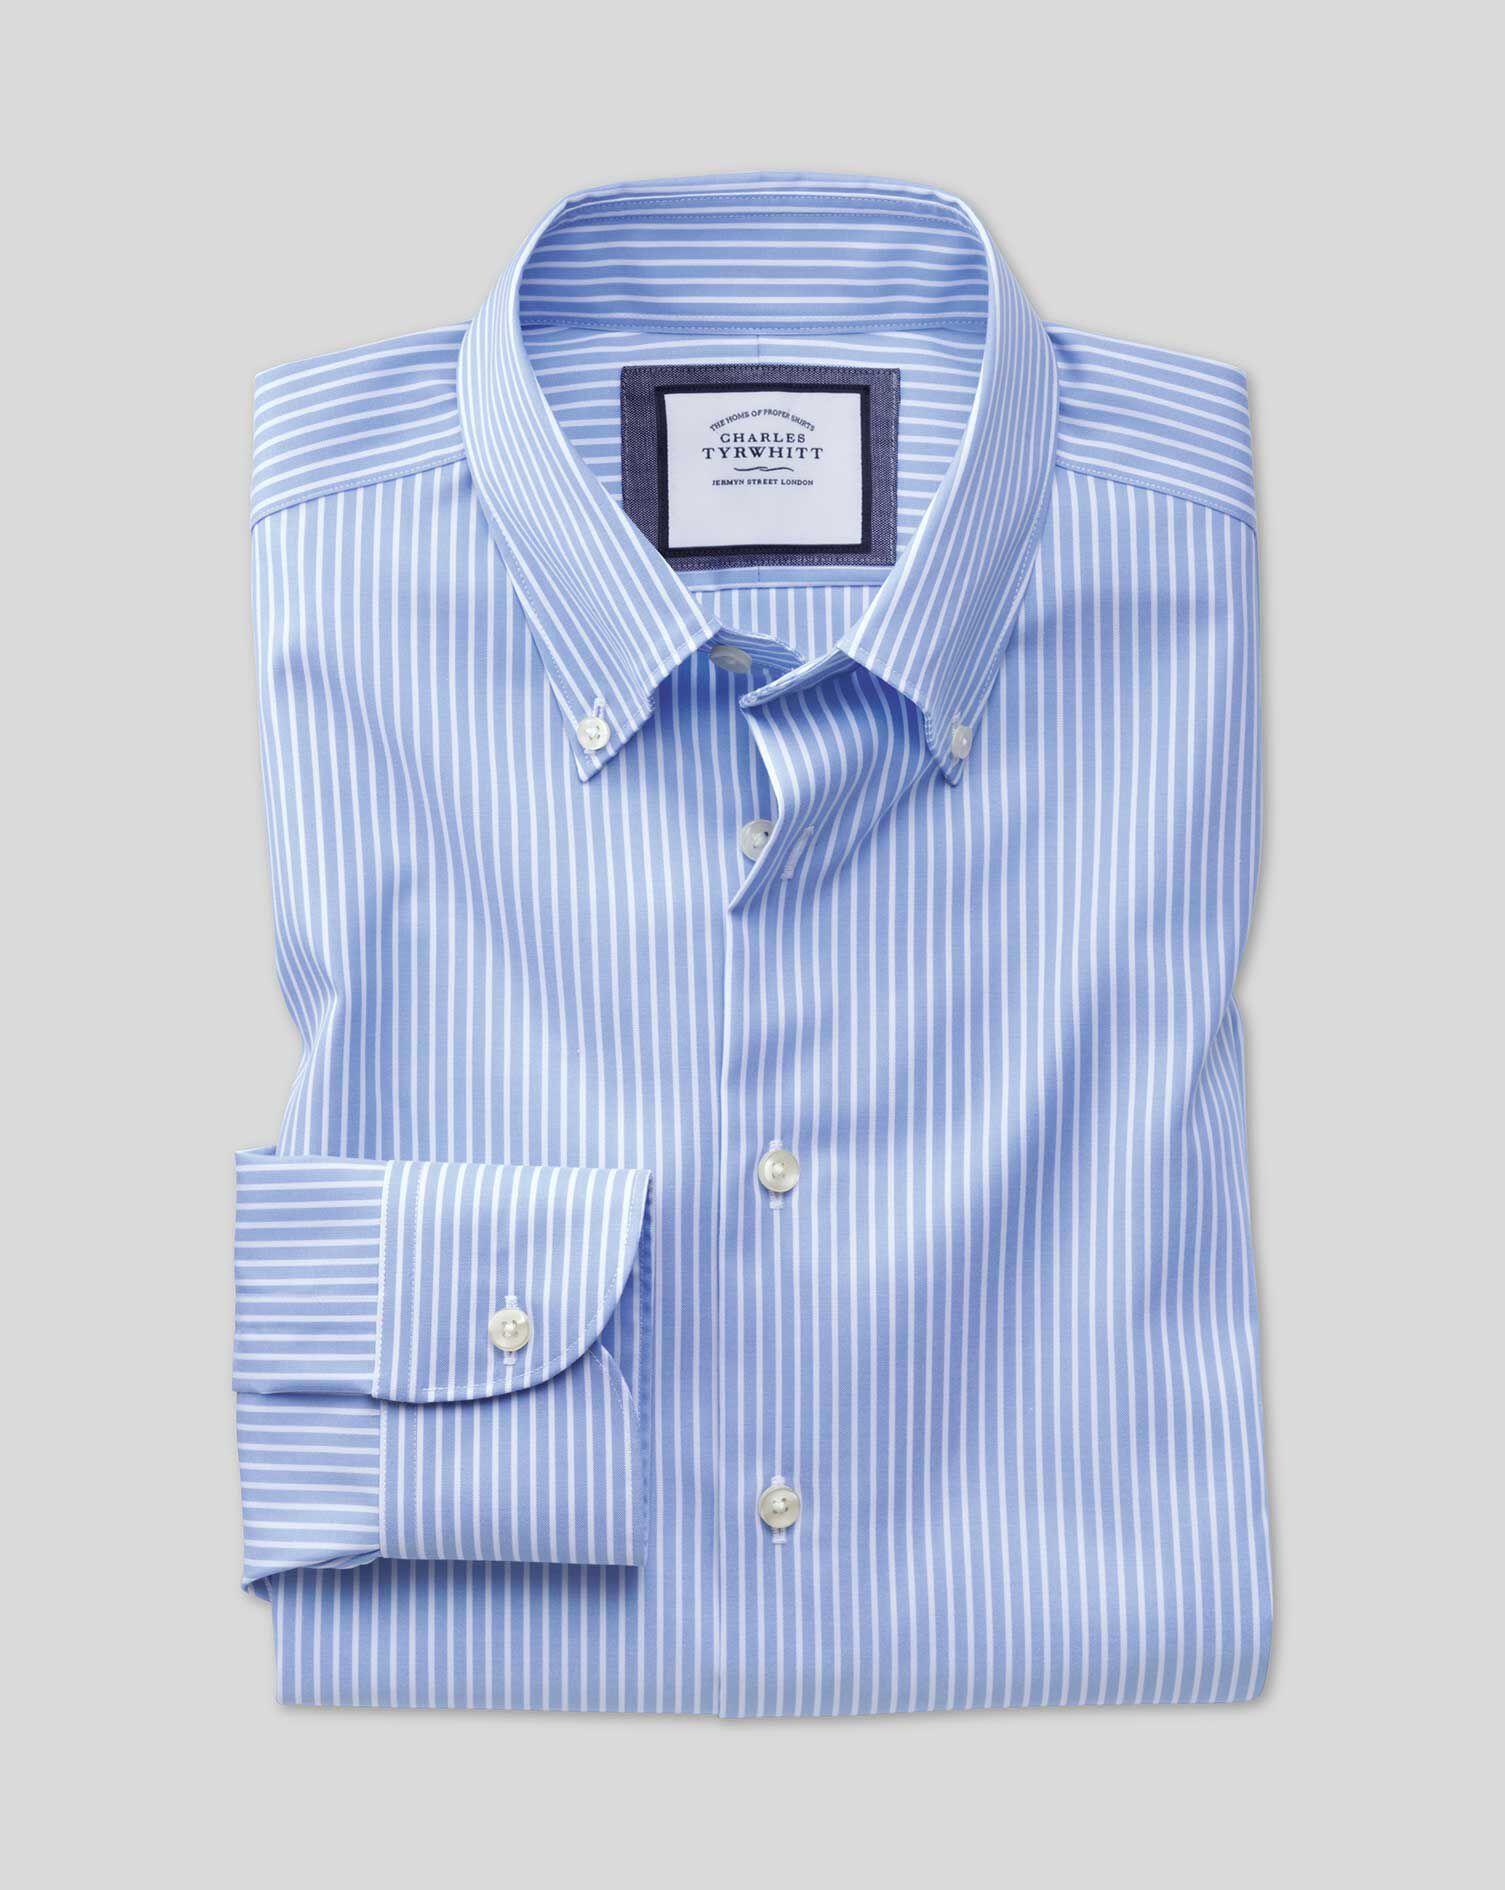 Chemises bleu foncé Charles Tyrwhitt Taille 44 | Zalando